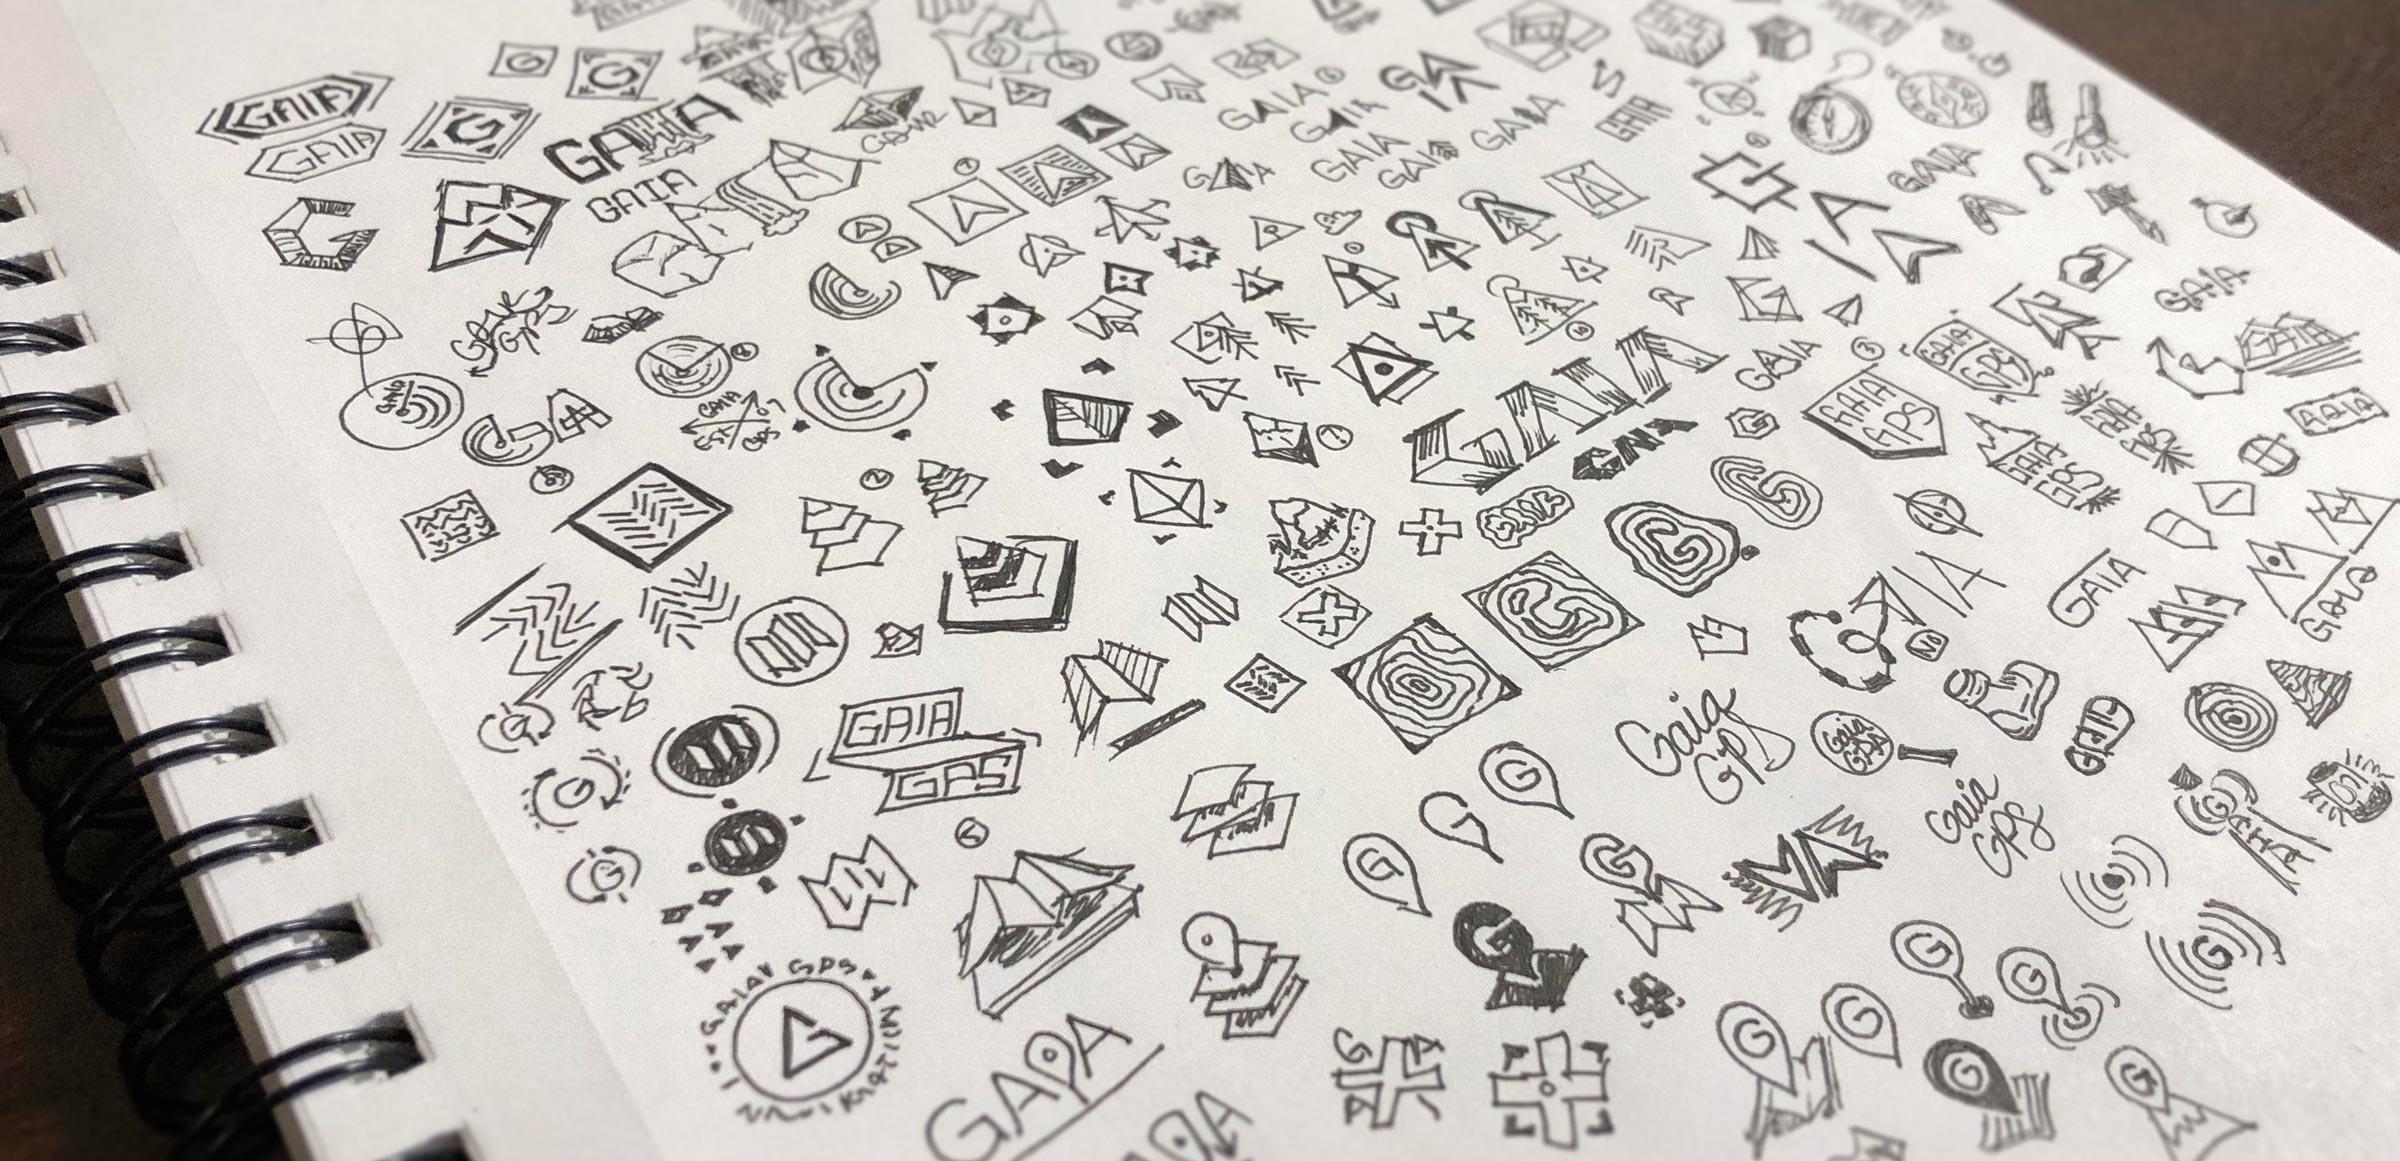 logo-concept-sketching